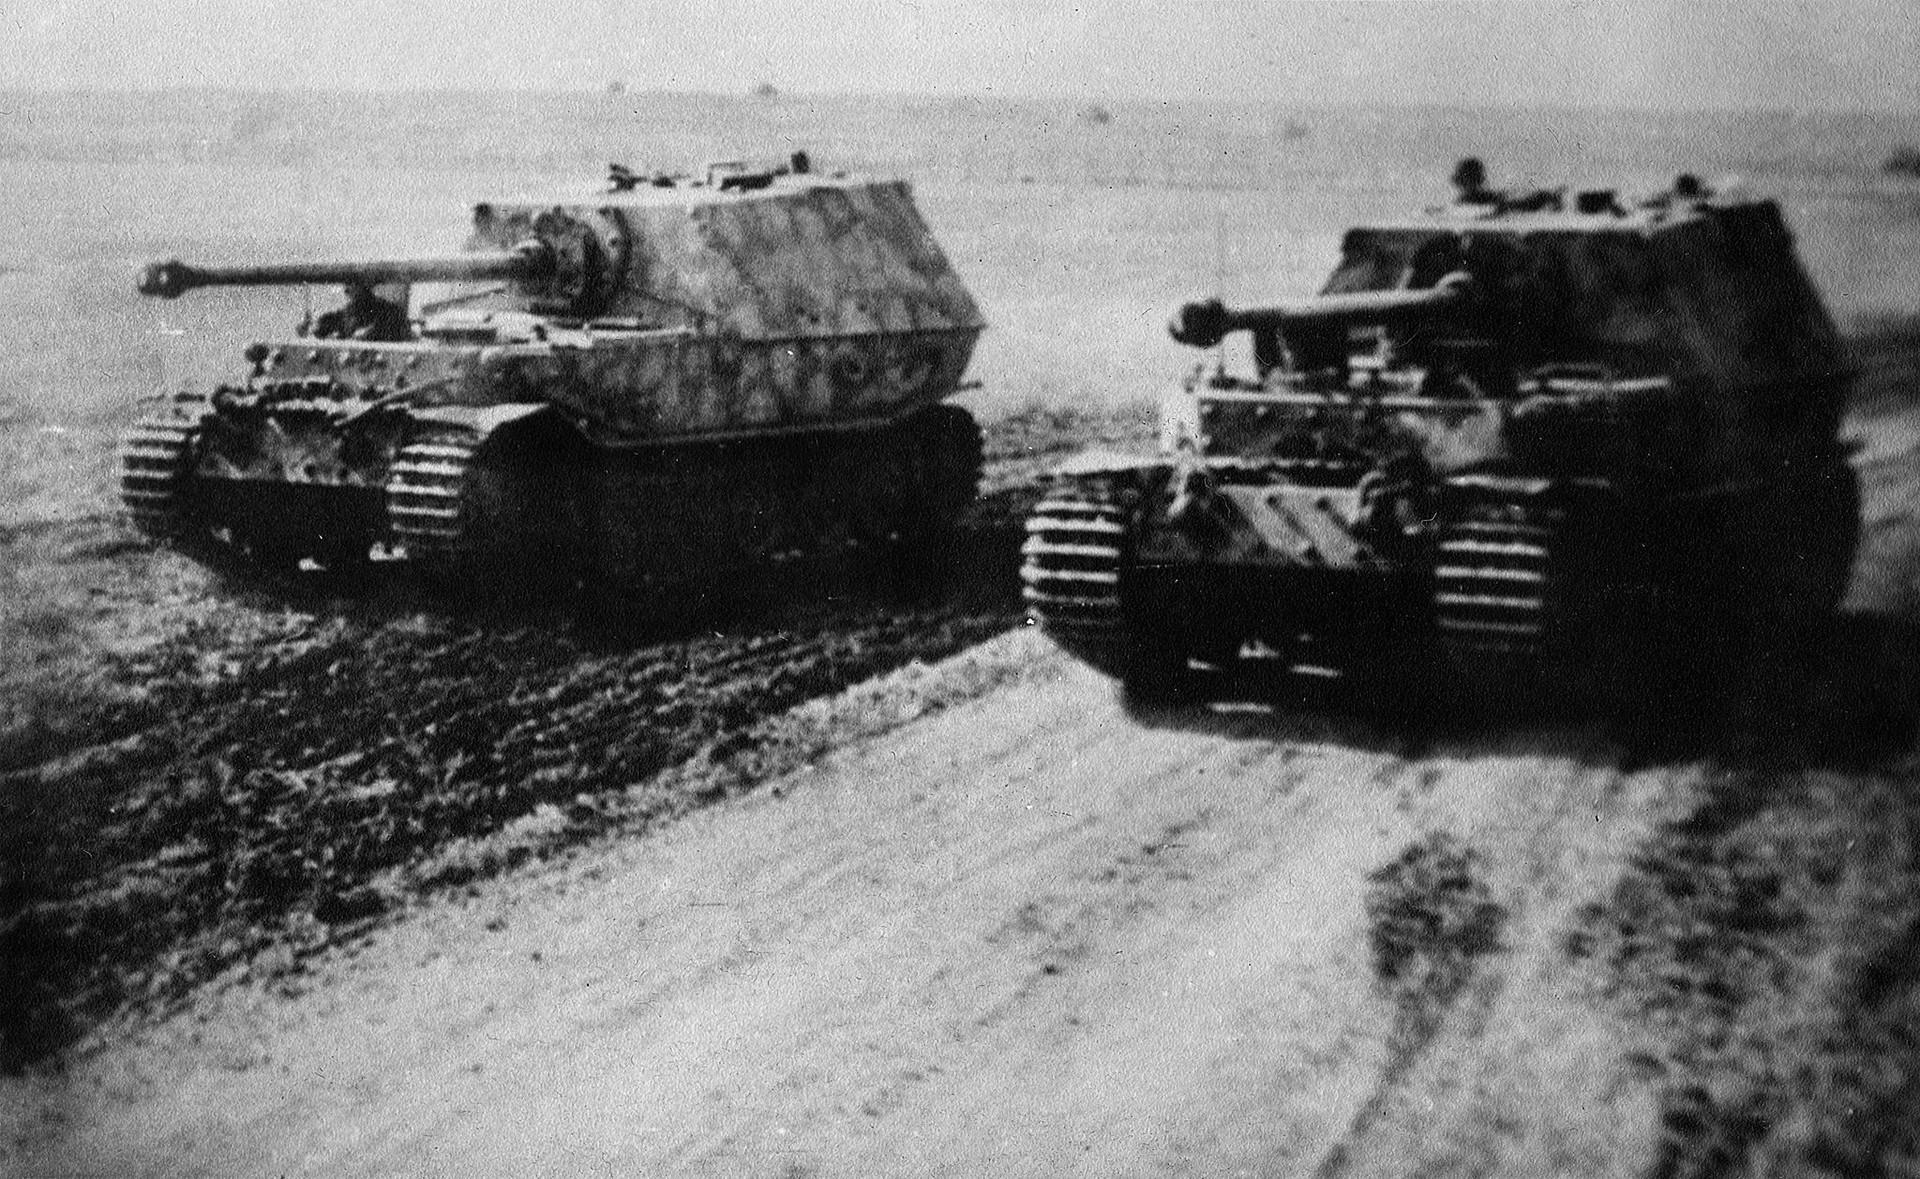 Nemška težka uničevalca tankov Sd.Kfz.184 Ferdinand